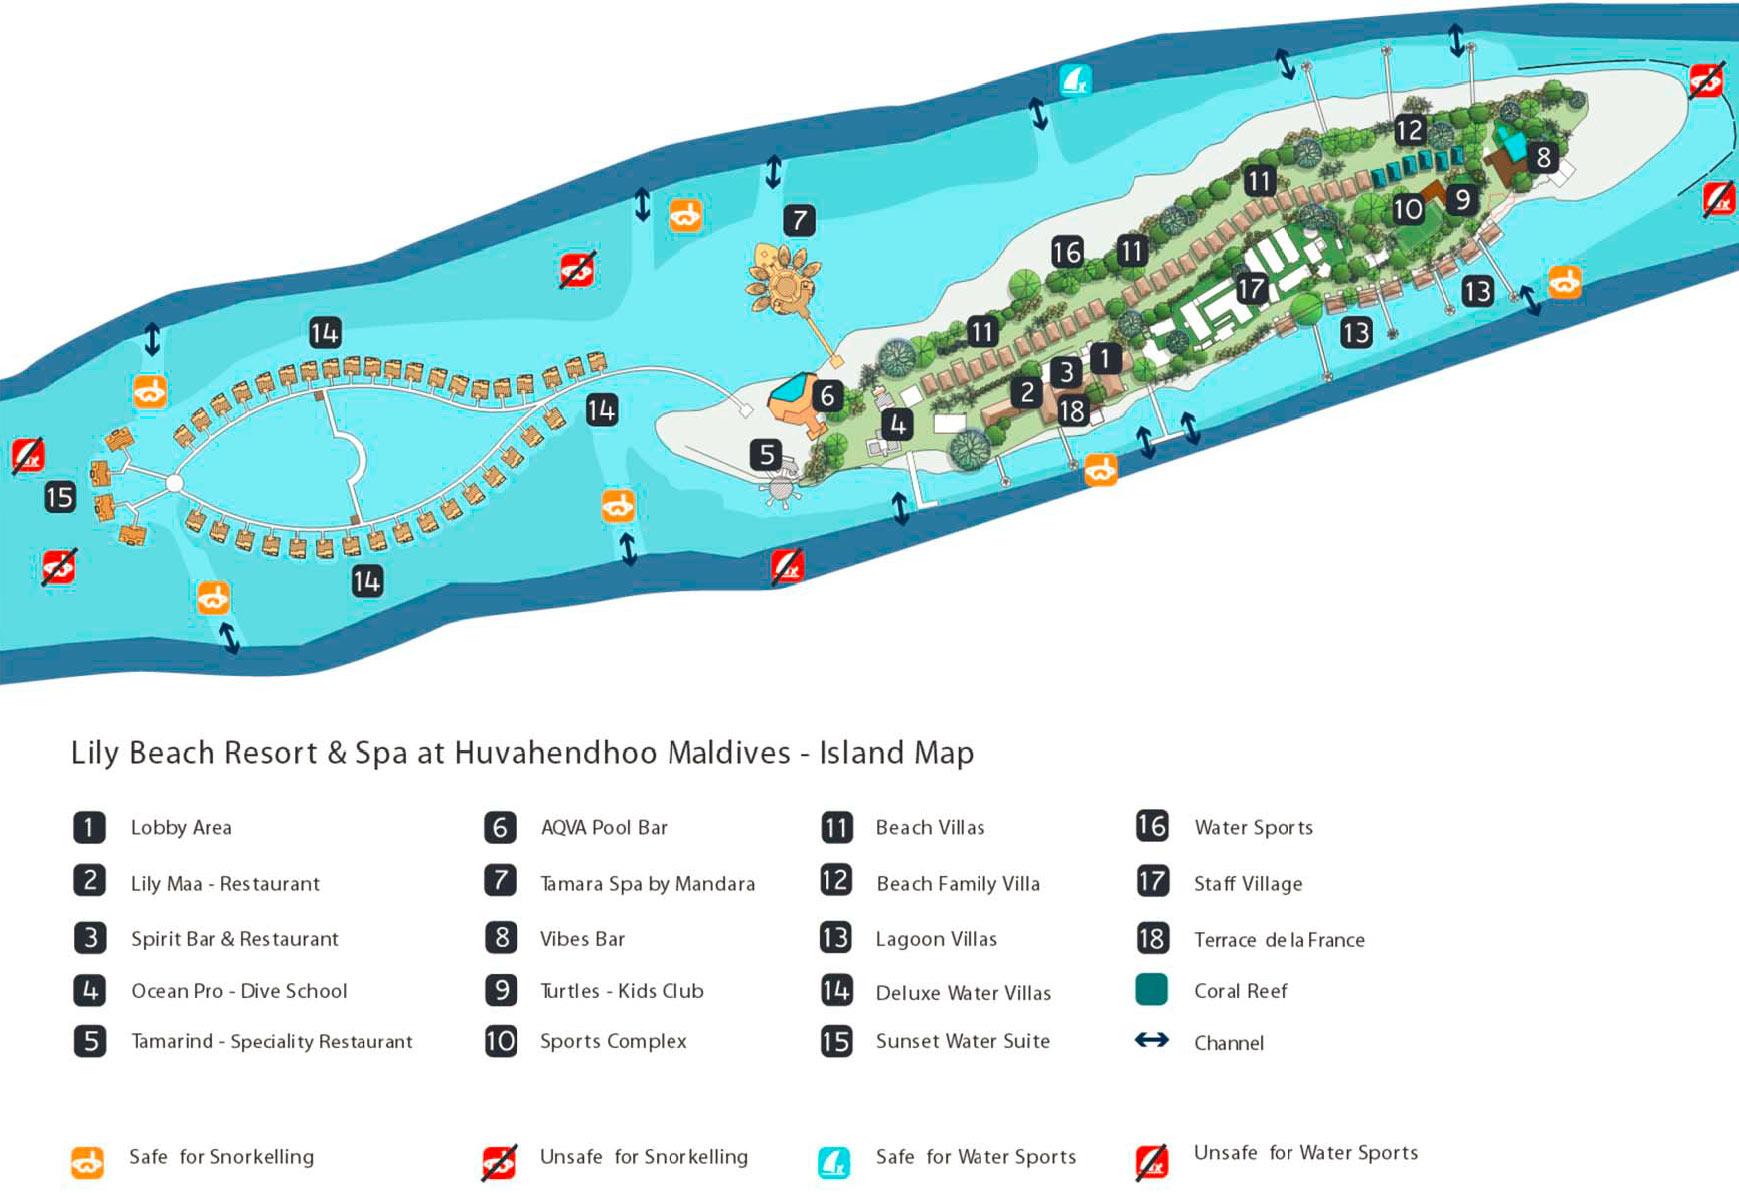 Lageplan Lily Beach Resort & Spa